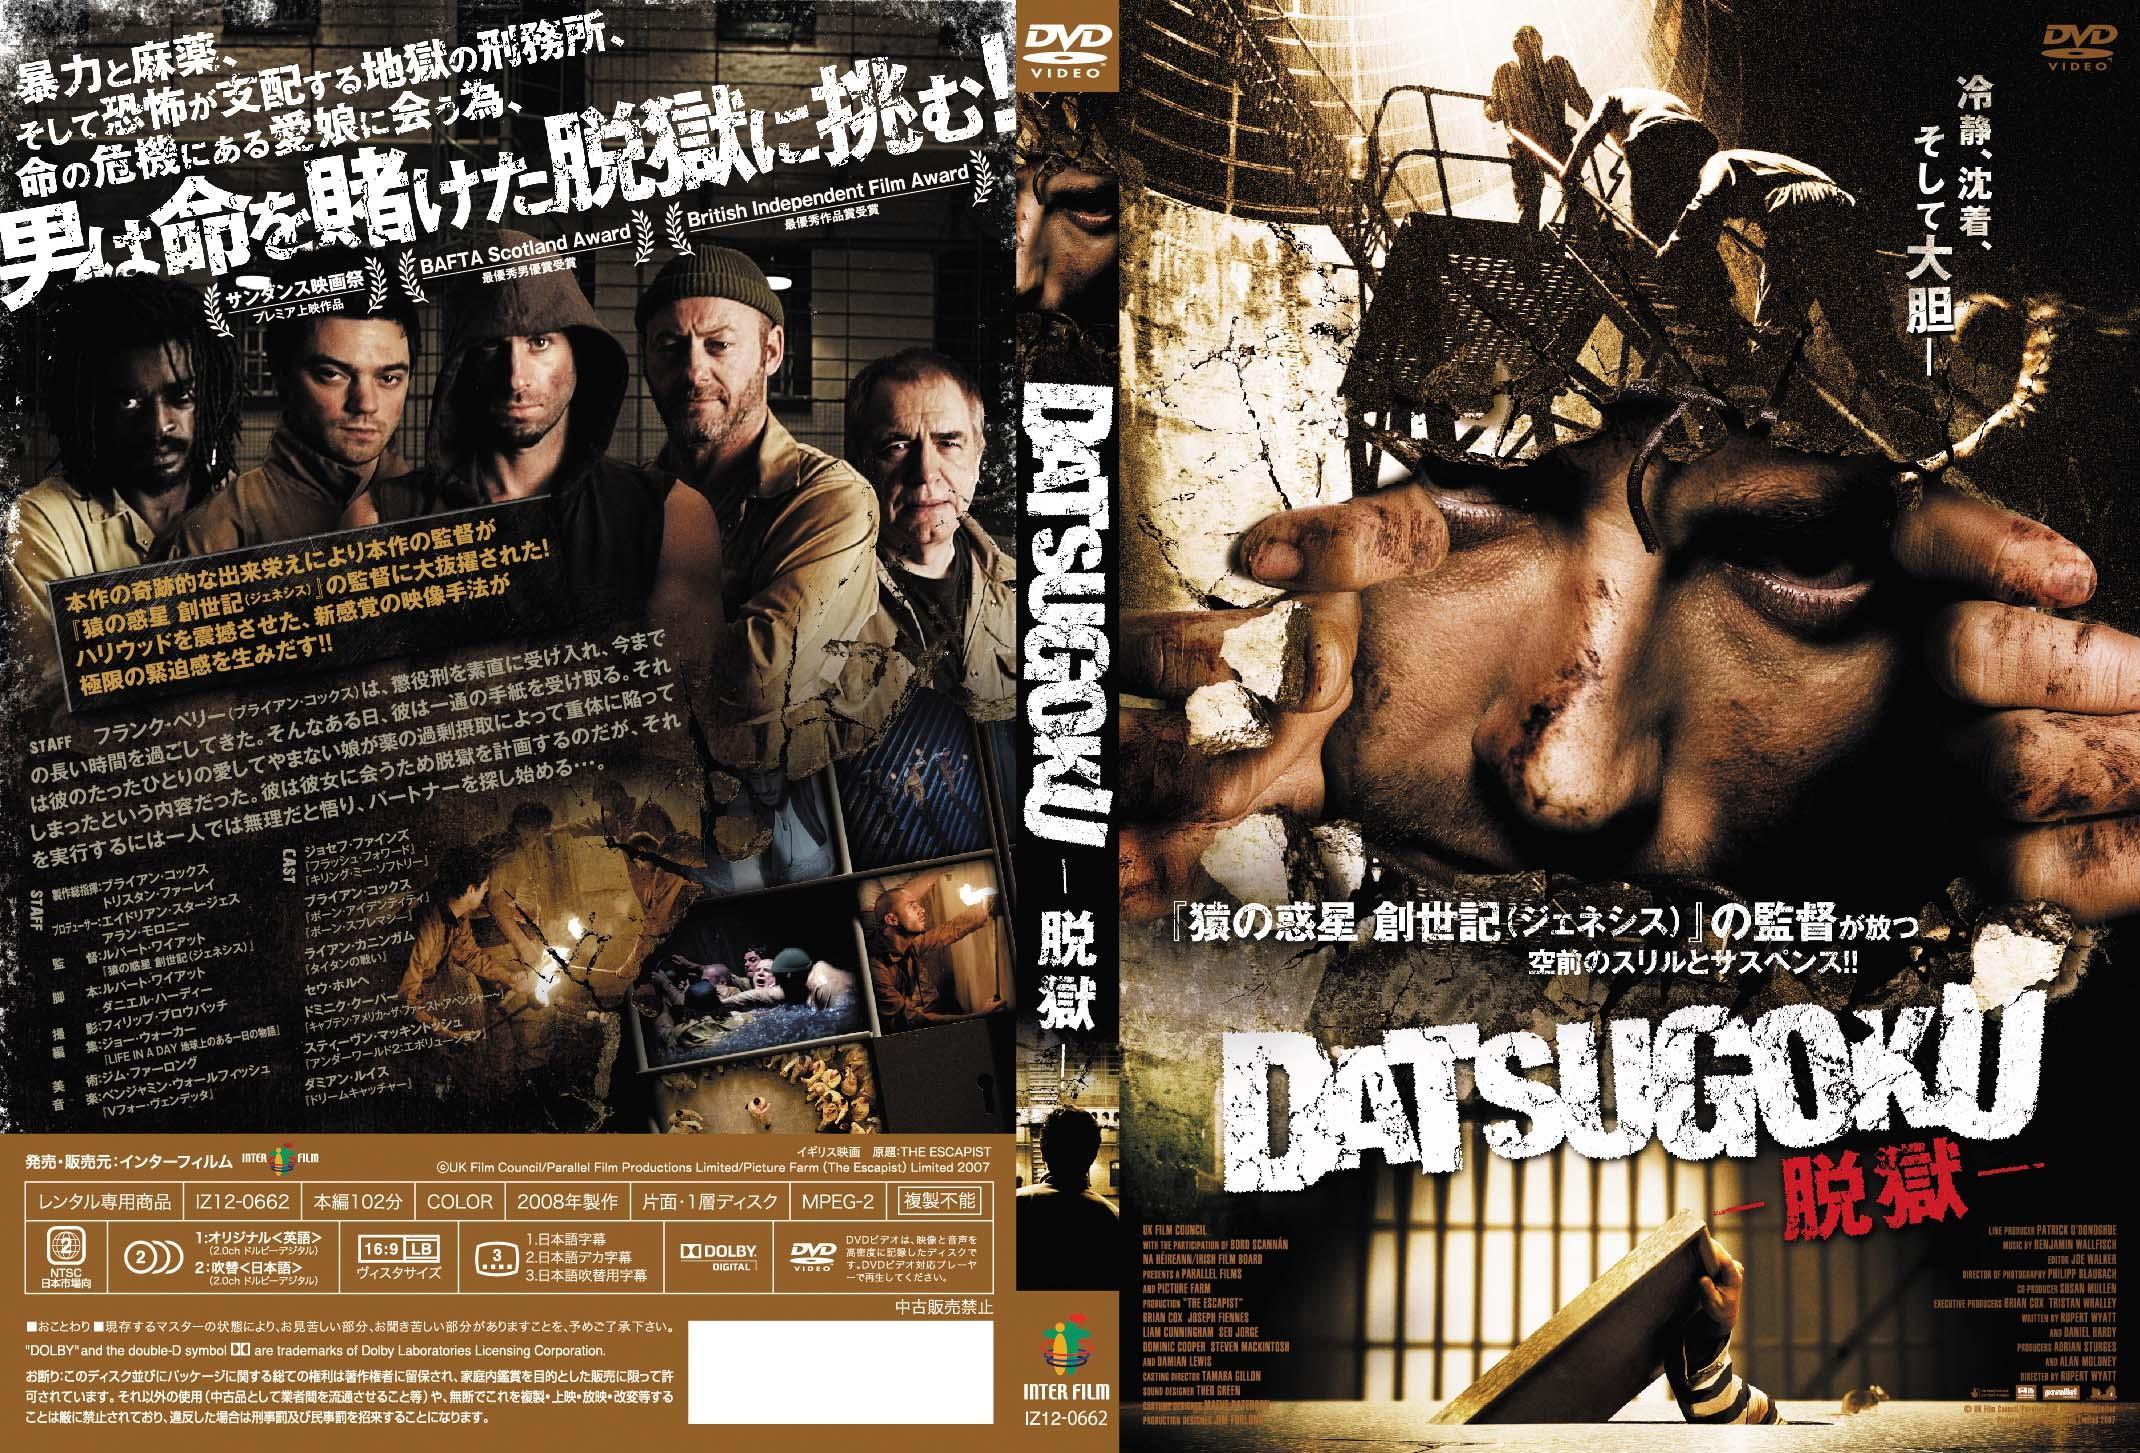 DATSUGOKU ~脱獄~ のサムネイル画像